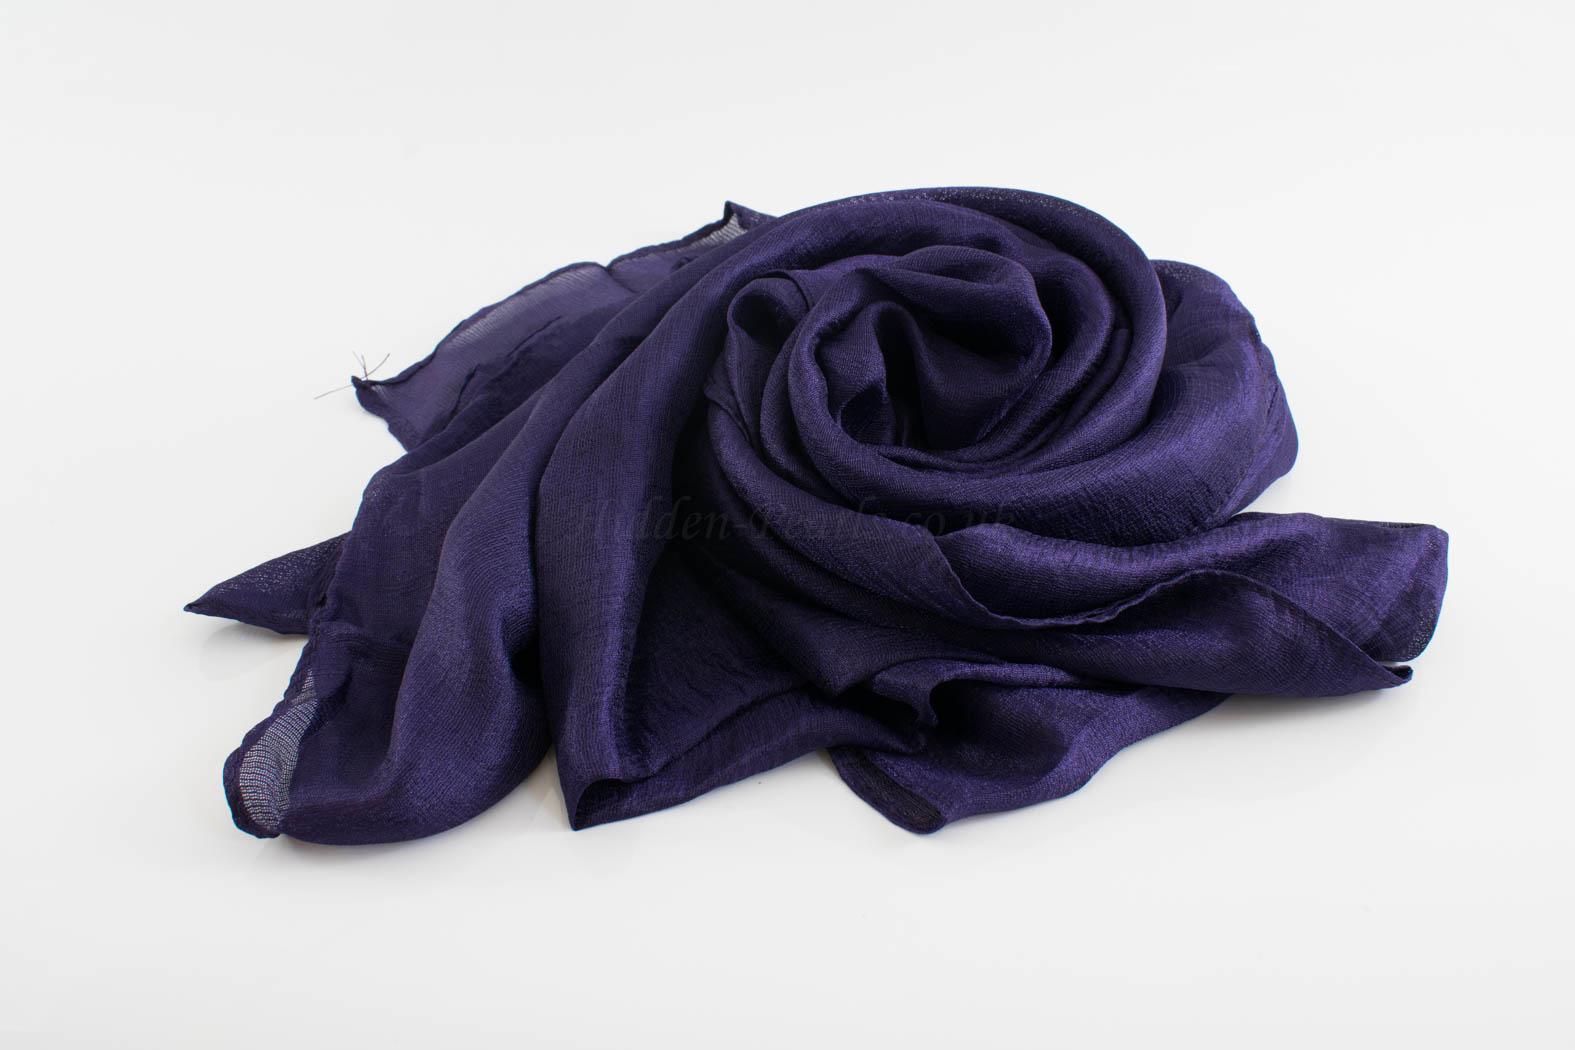 Shimmer SIlk Hijab - Hidden Pearls - Plum